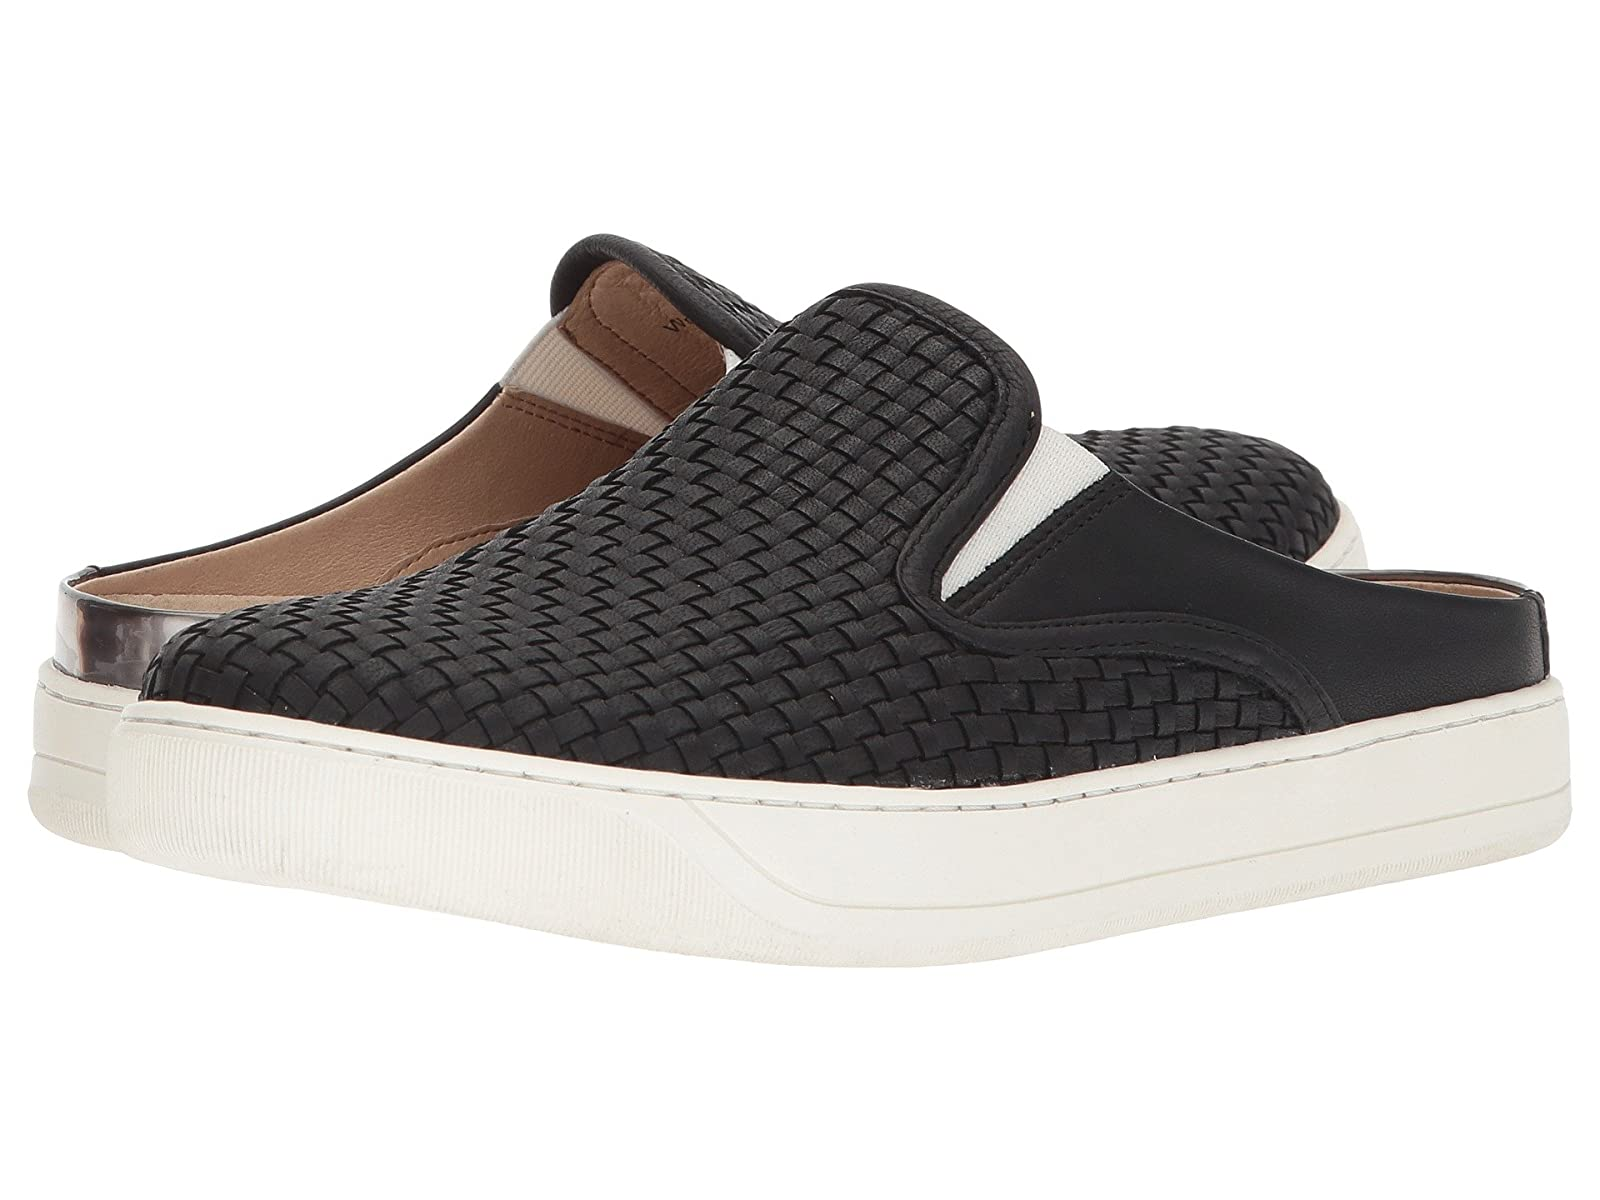 Johnston & Murphy EvieCheap and distinctive eye-catching shoes